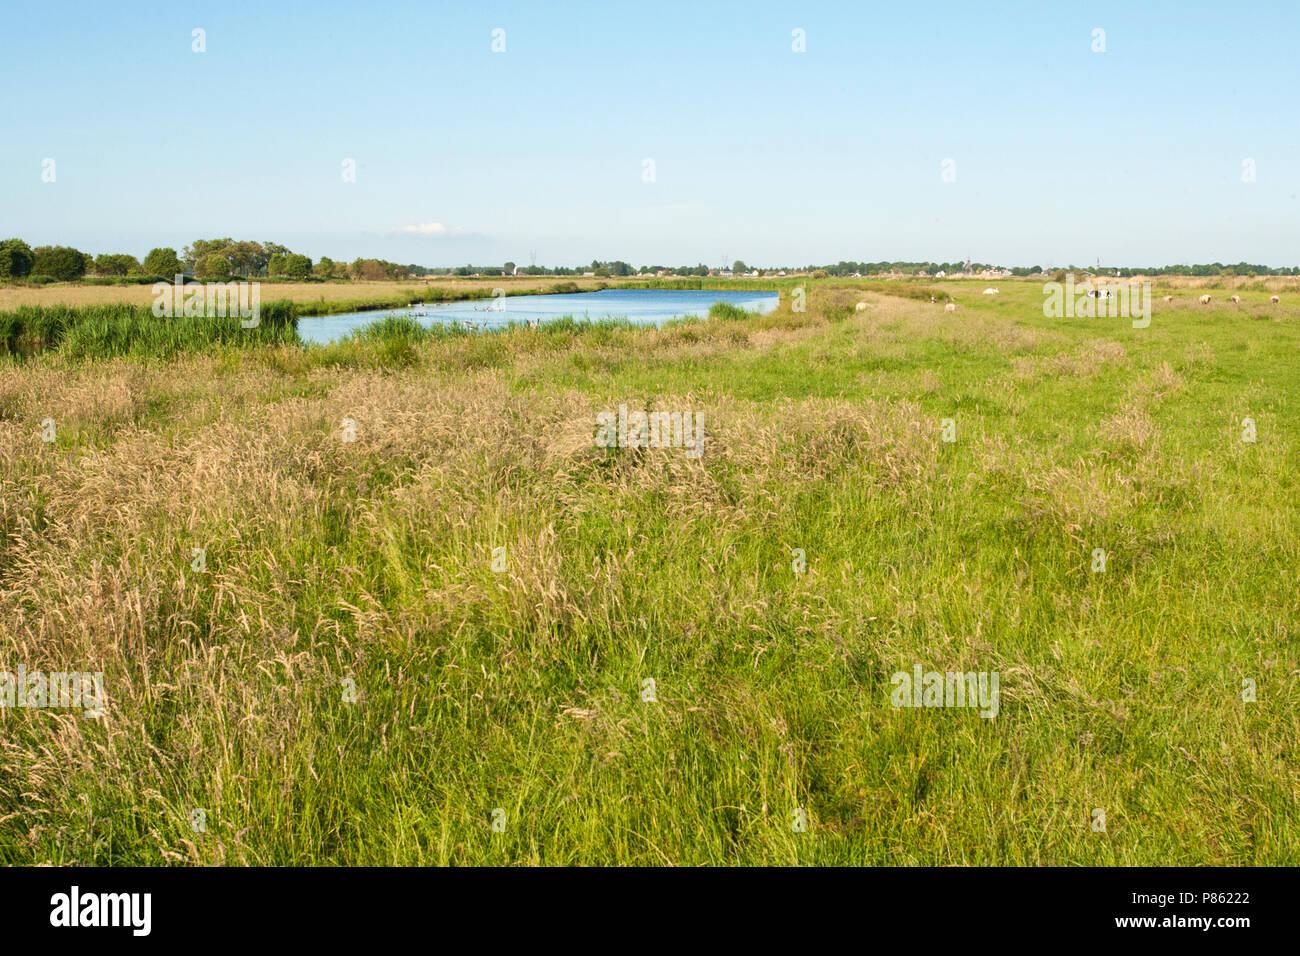 Ilperveld, Noord-Holland; Ilperveld, Netherlands - Stock Image